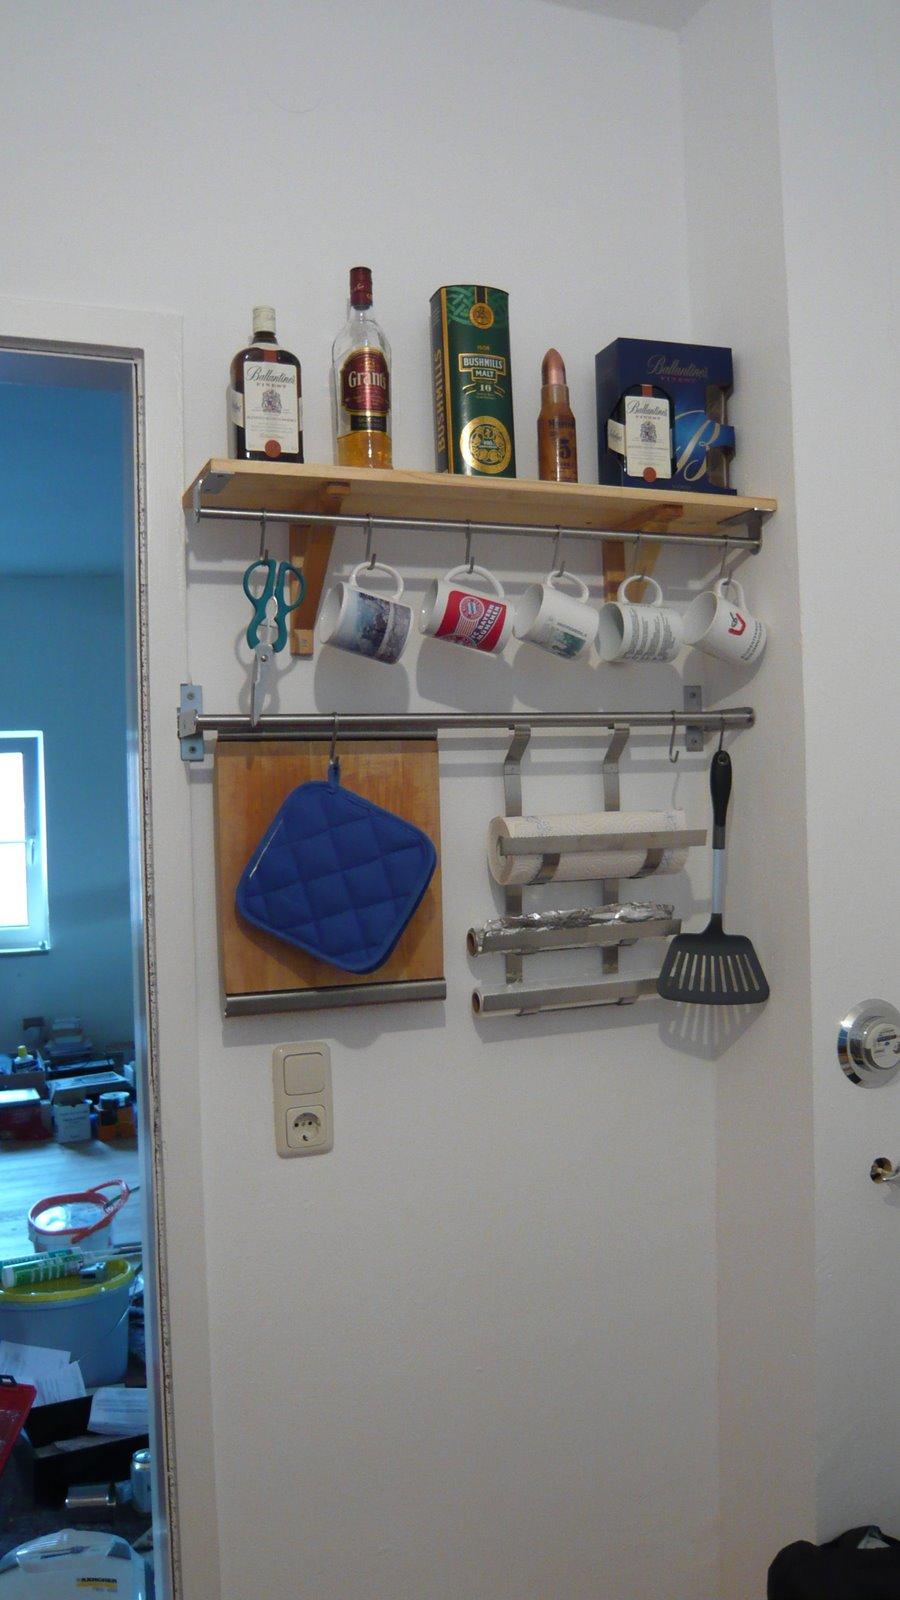 ikea regal k che haus design und m bel ideen. Black Bedroom Furniture Sets. Home Design Ideas